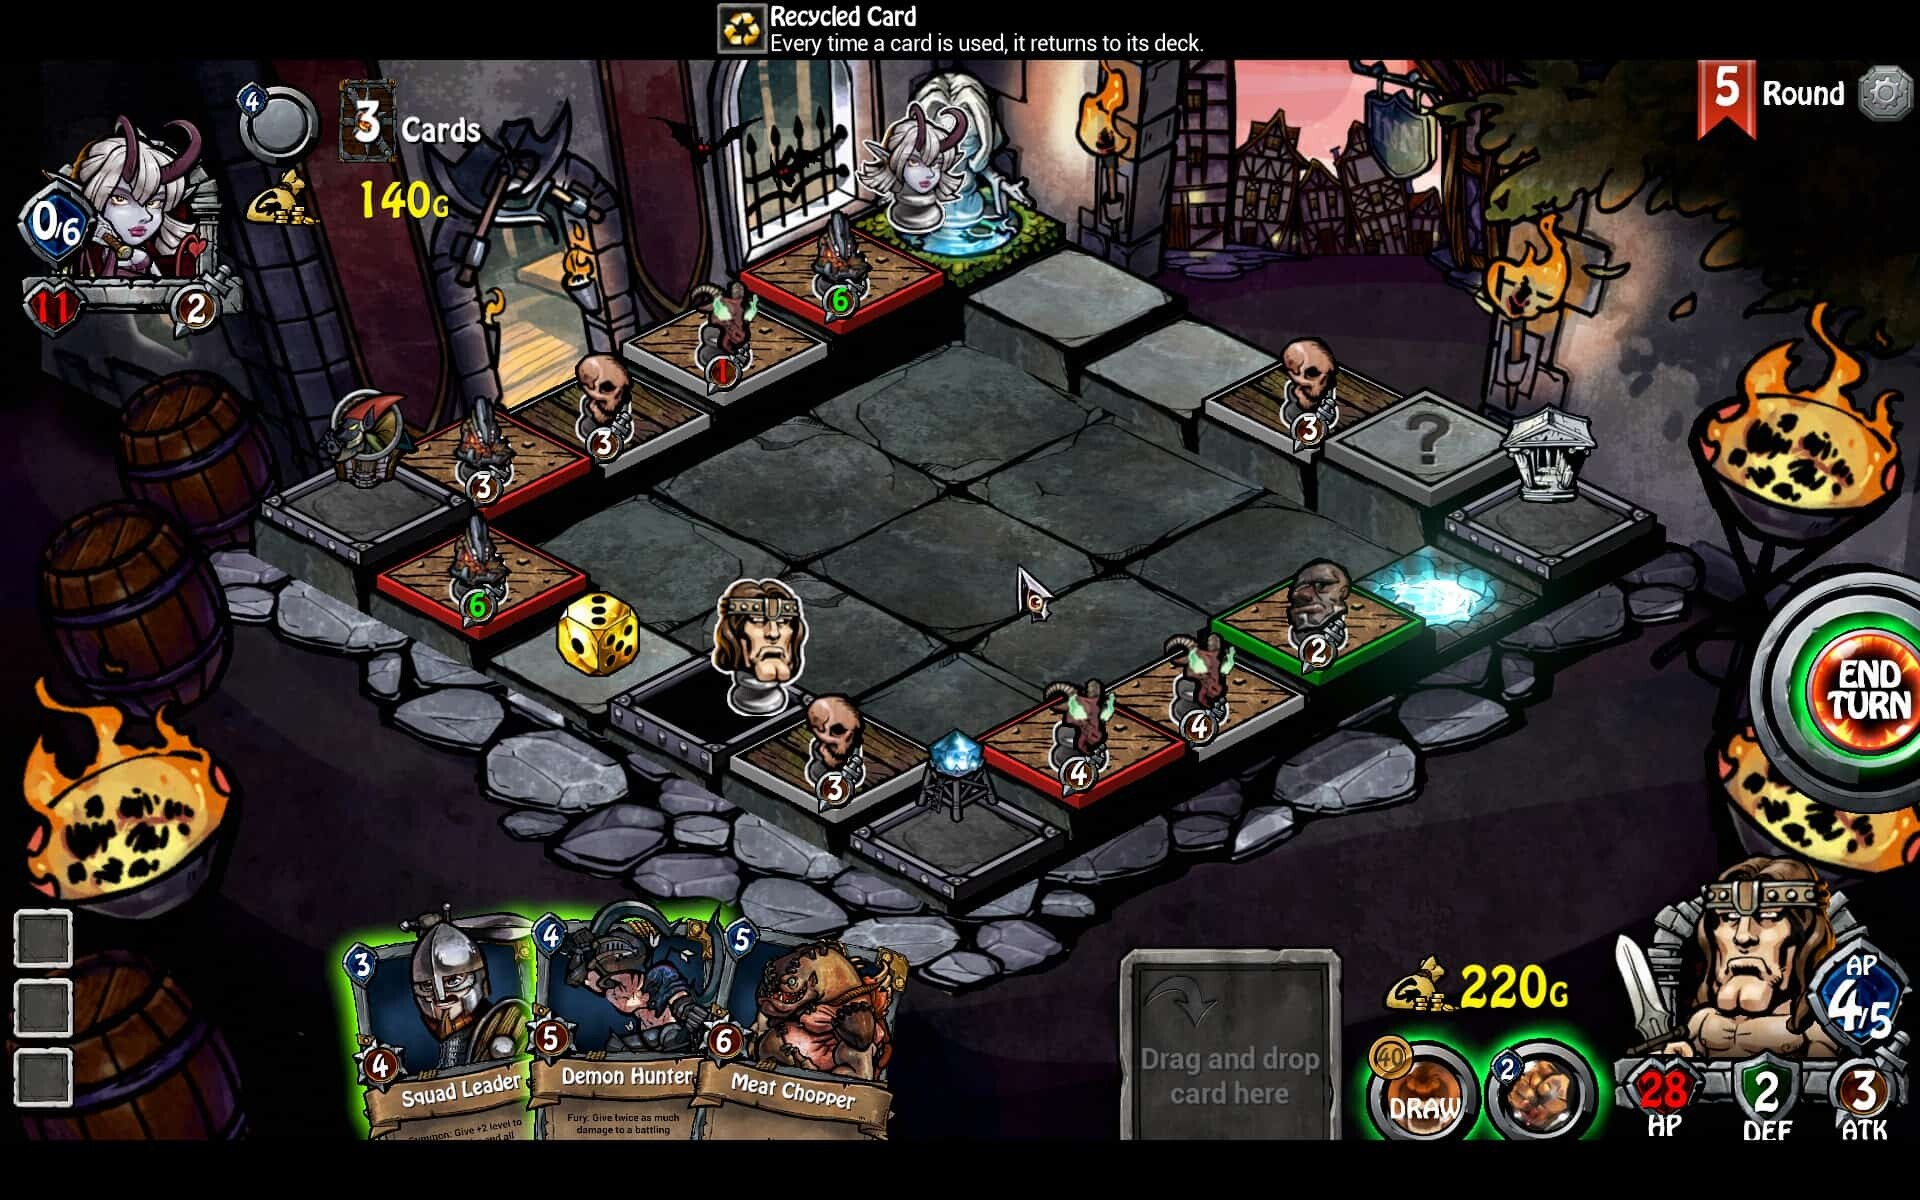 Dicetiny game screenshot, gameboard